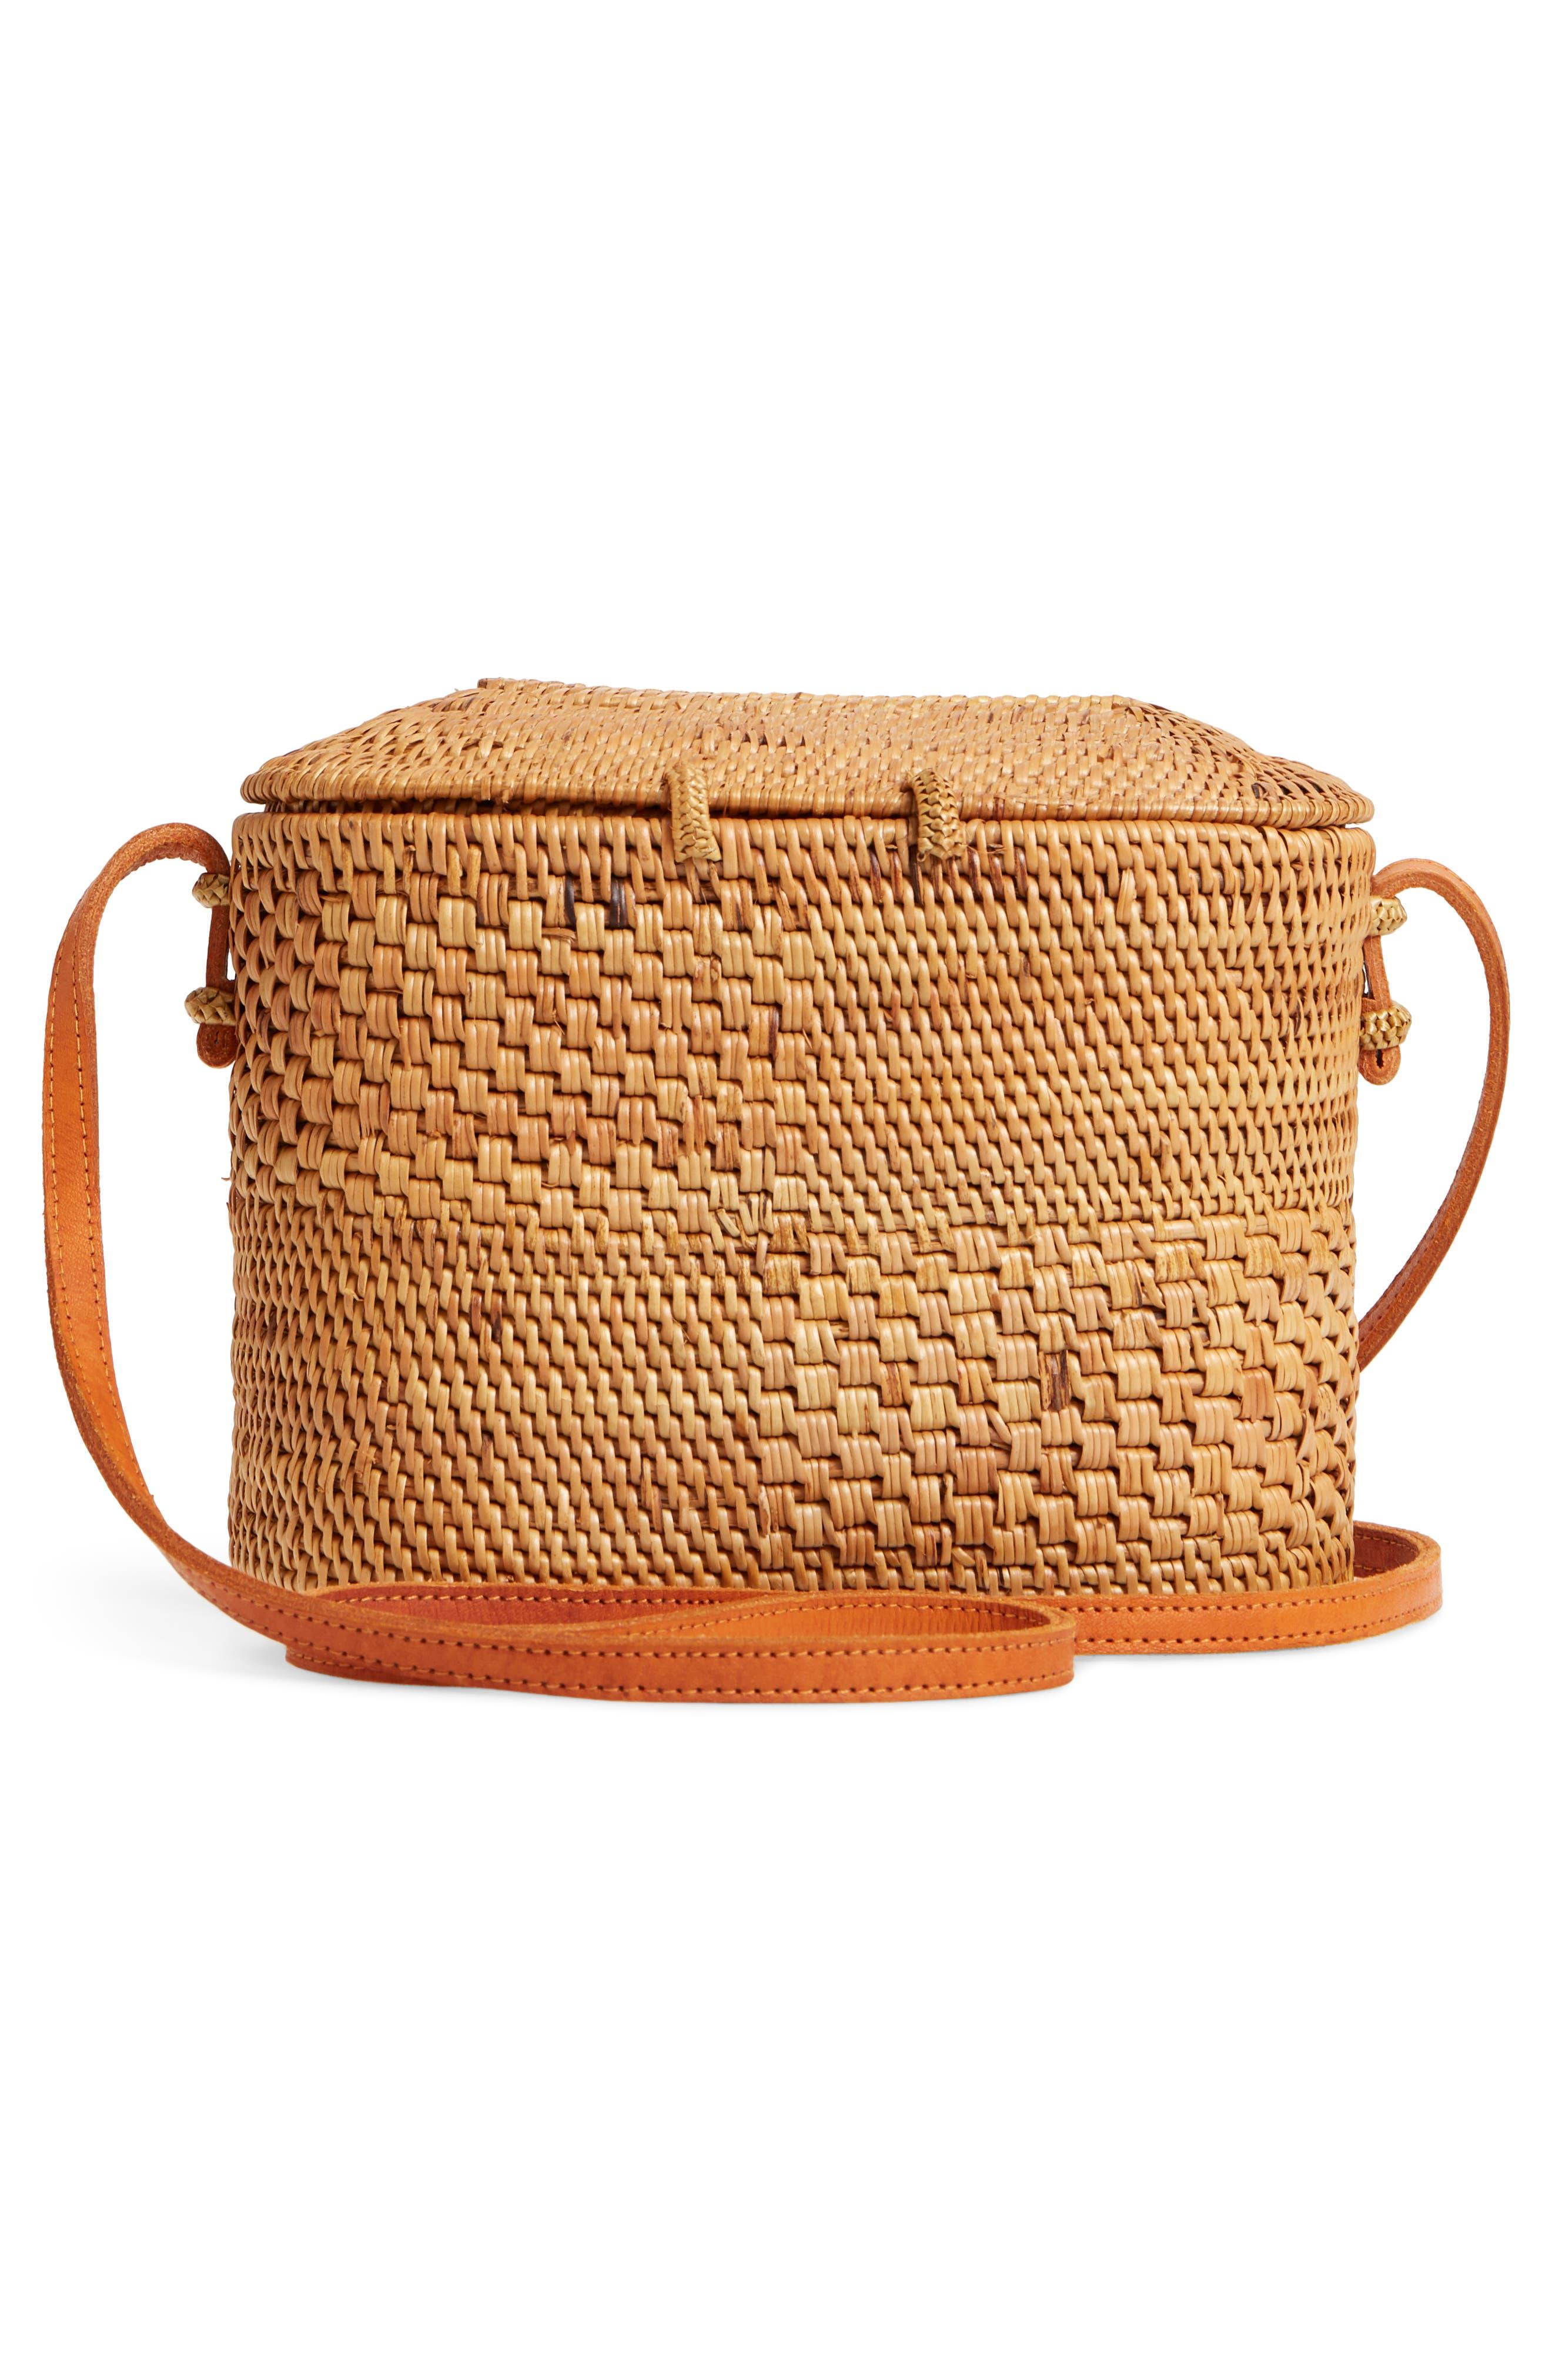 Woven Rattan Box Crossbody Bag,                             Alternate thumbnail 3, color,                             200